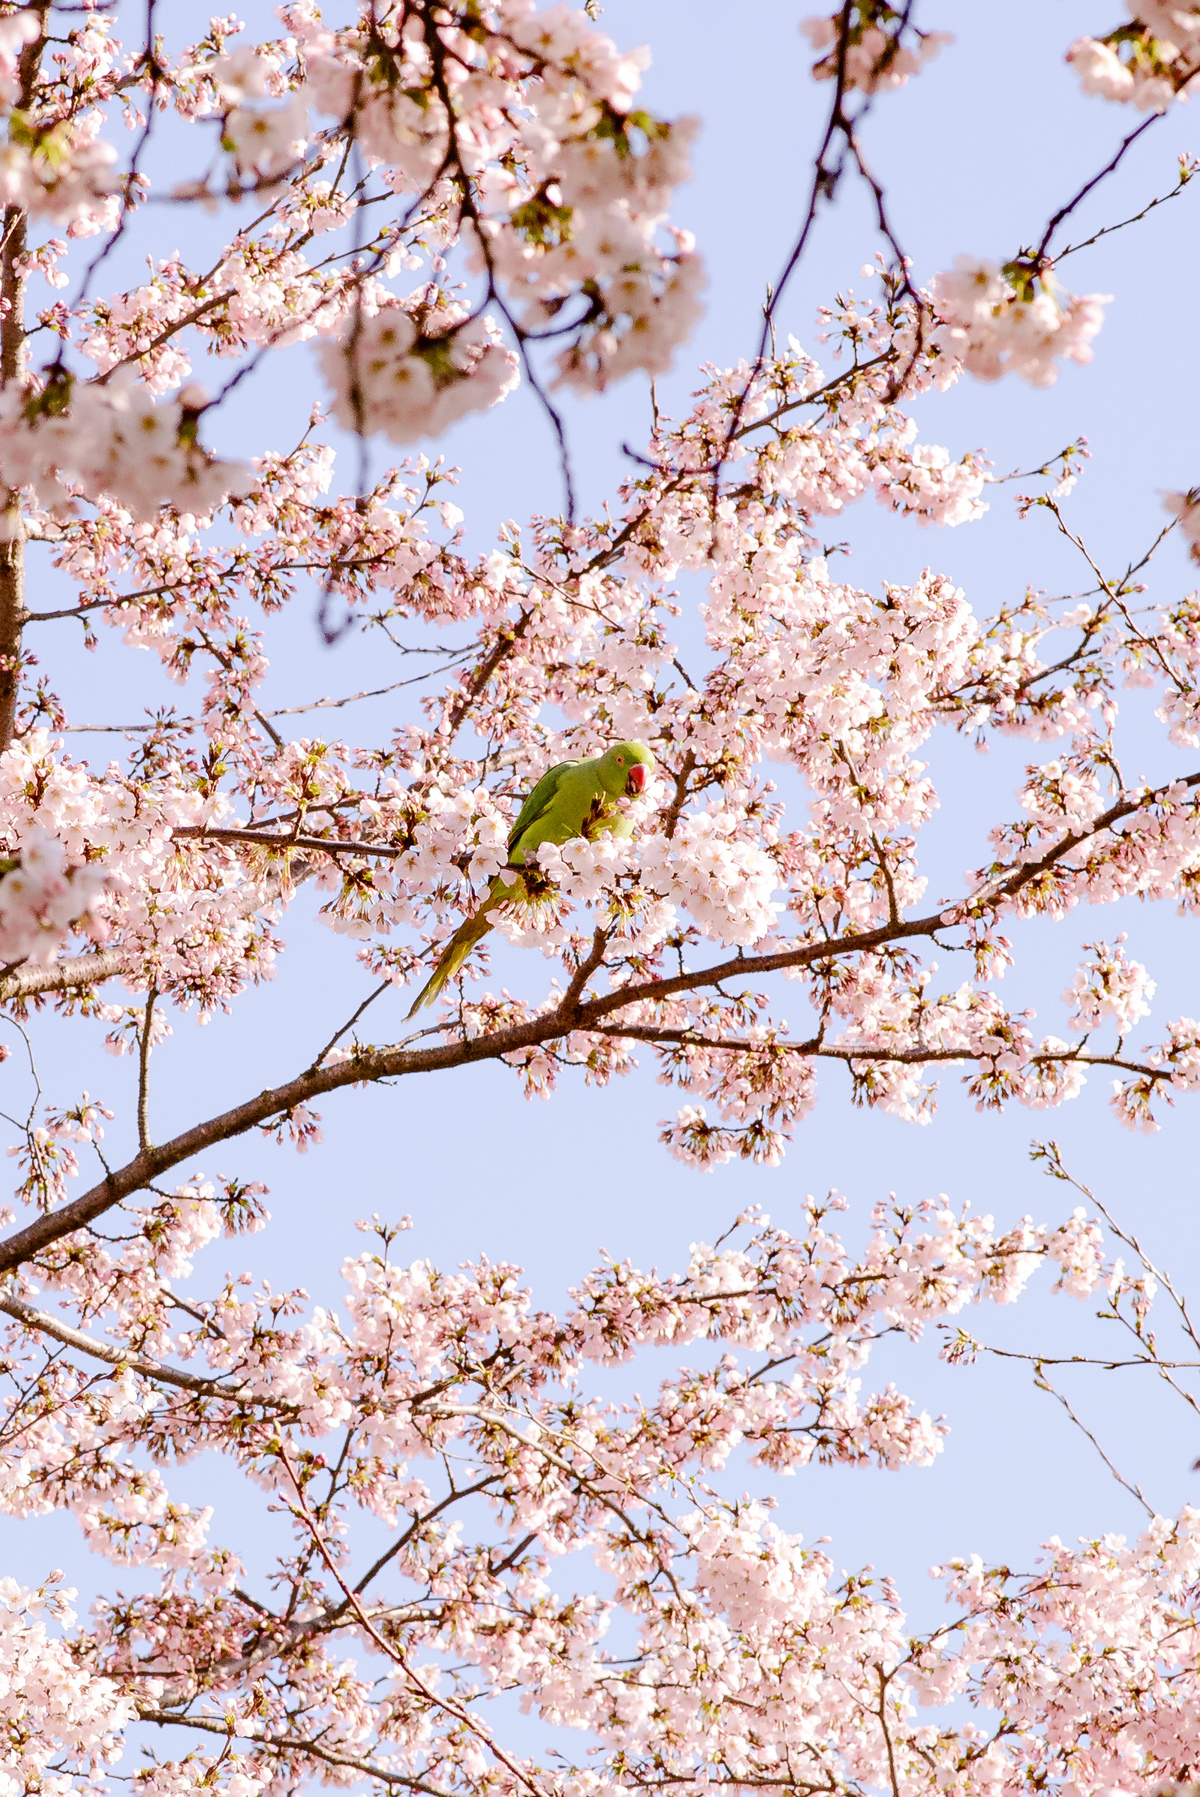 Imagem capa - 5 tips for Cherry Blossom pictures in Amsterdam por Joanna Pantigoso